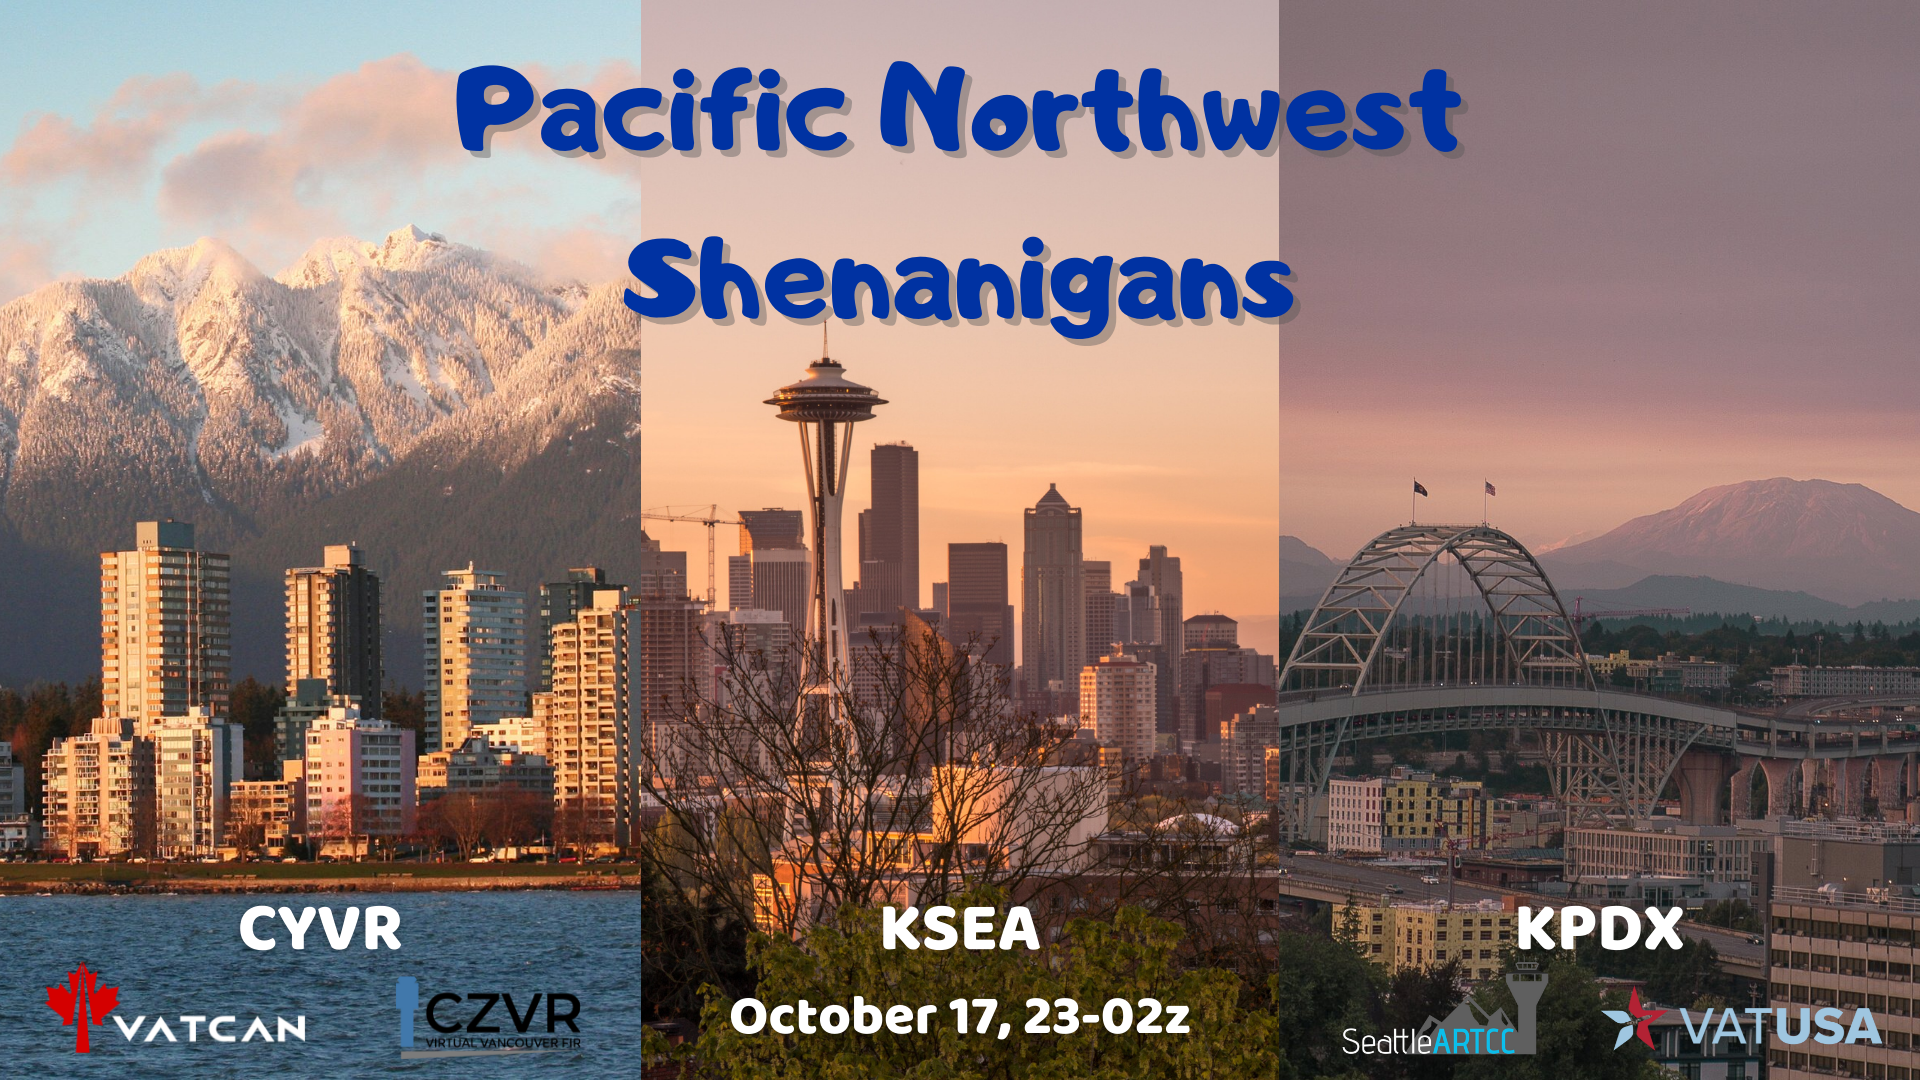 Pacific Northwest Shenanigans - Virtual Norwegian Events